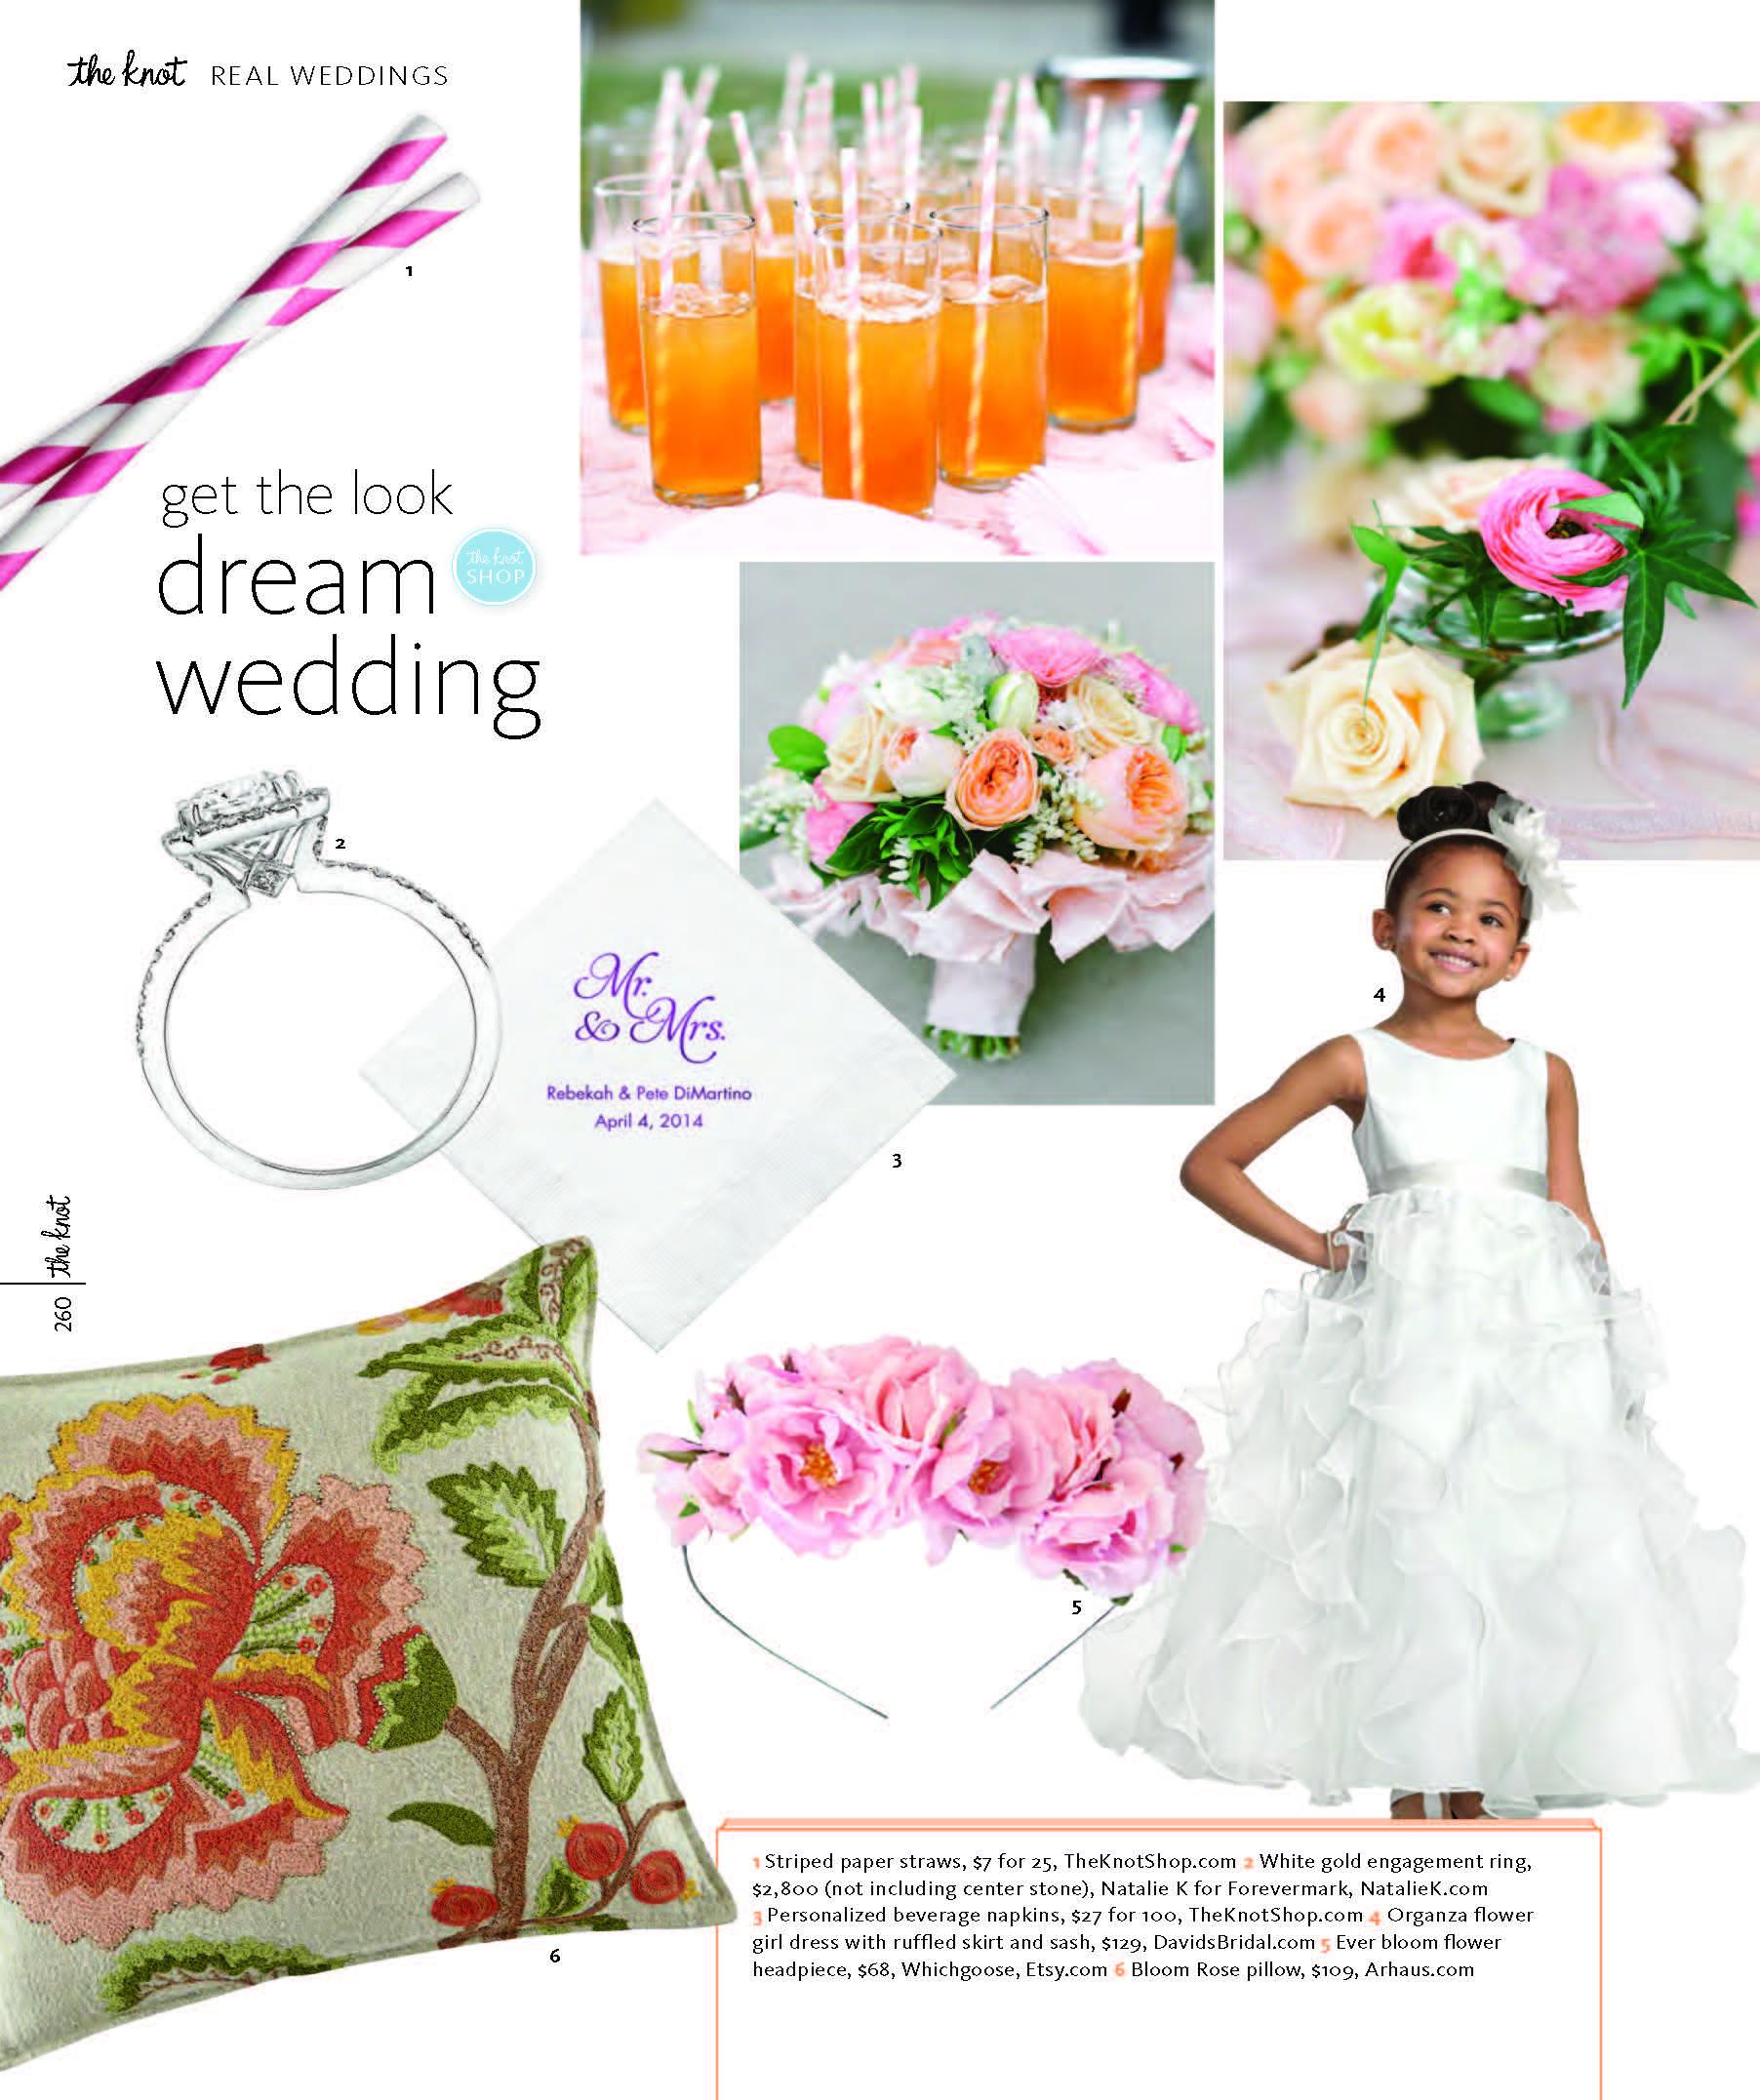 TKM14F_RW_Dream_RebekahPete_p252-260_Page_5.jpg